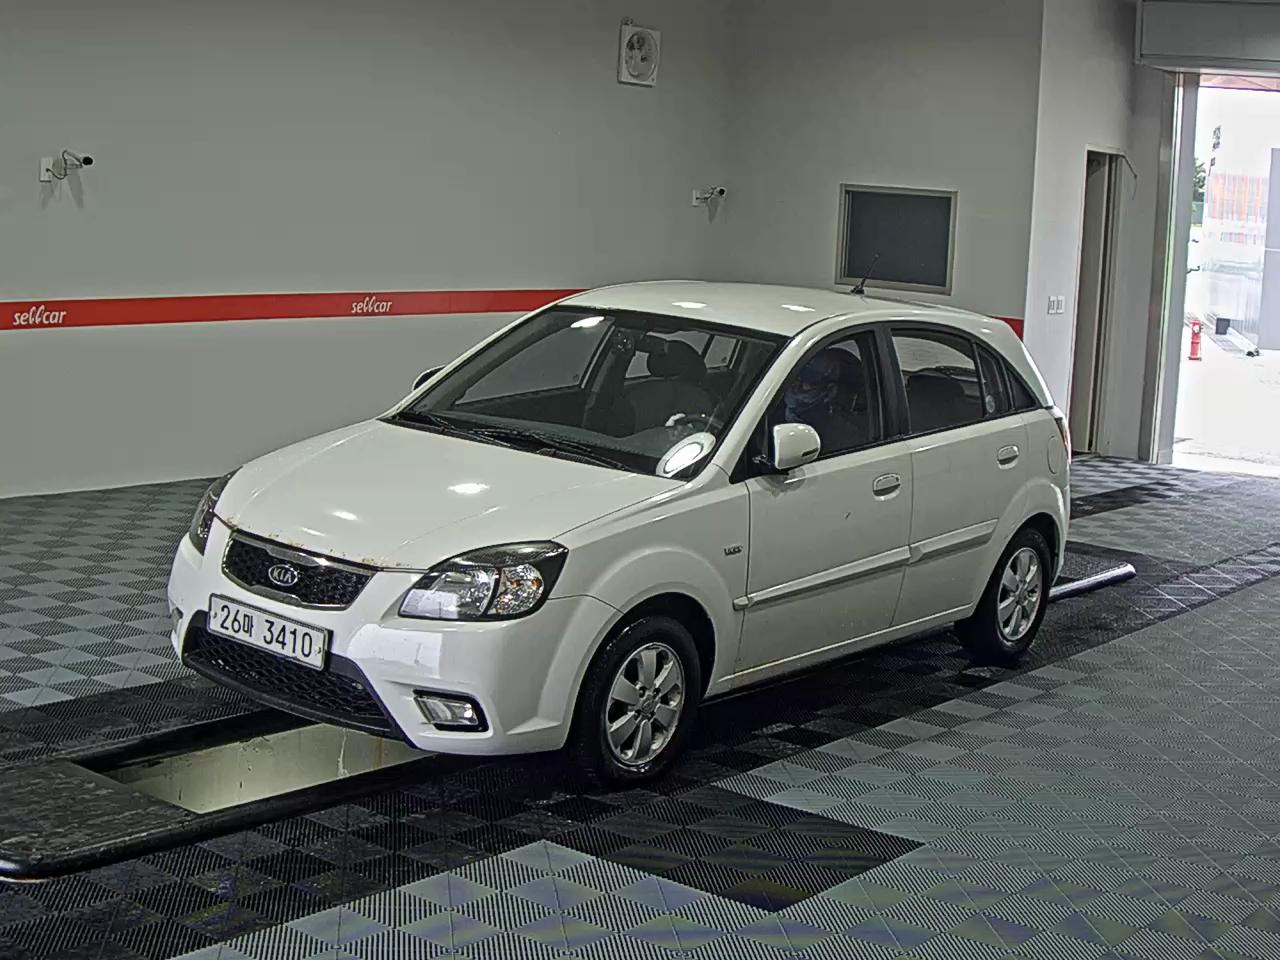 1738 Kia Pride new model 05-11 Diesel 5DR 1-5 VGT LX